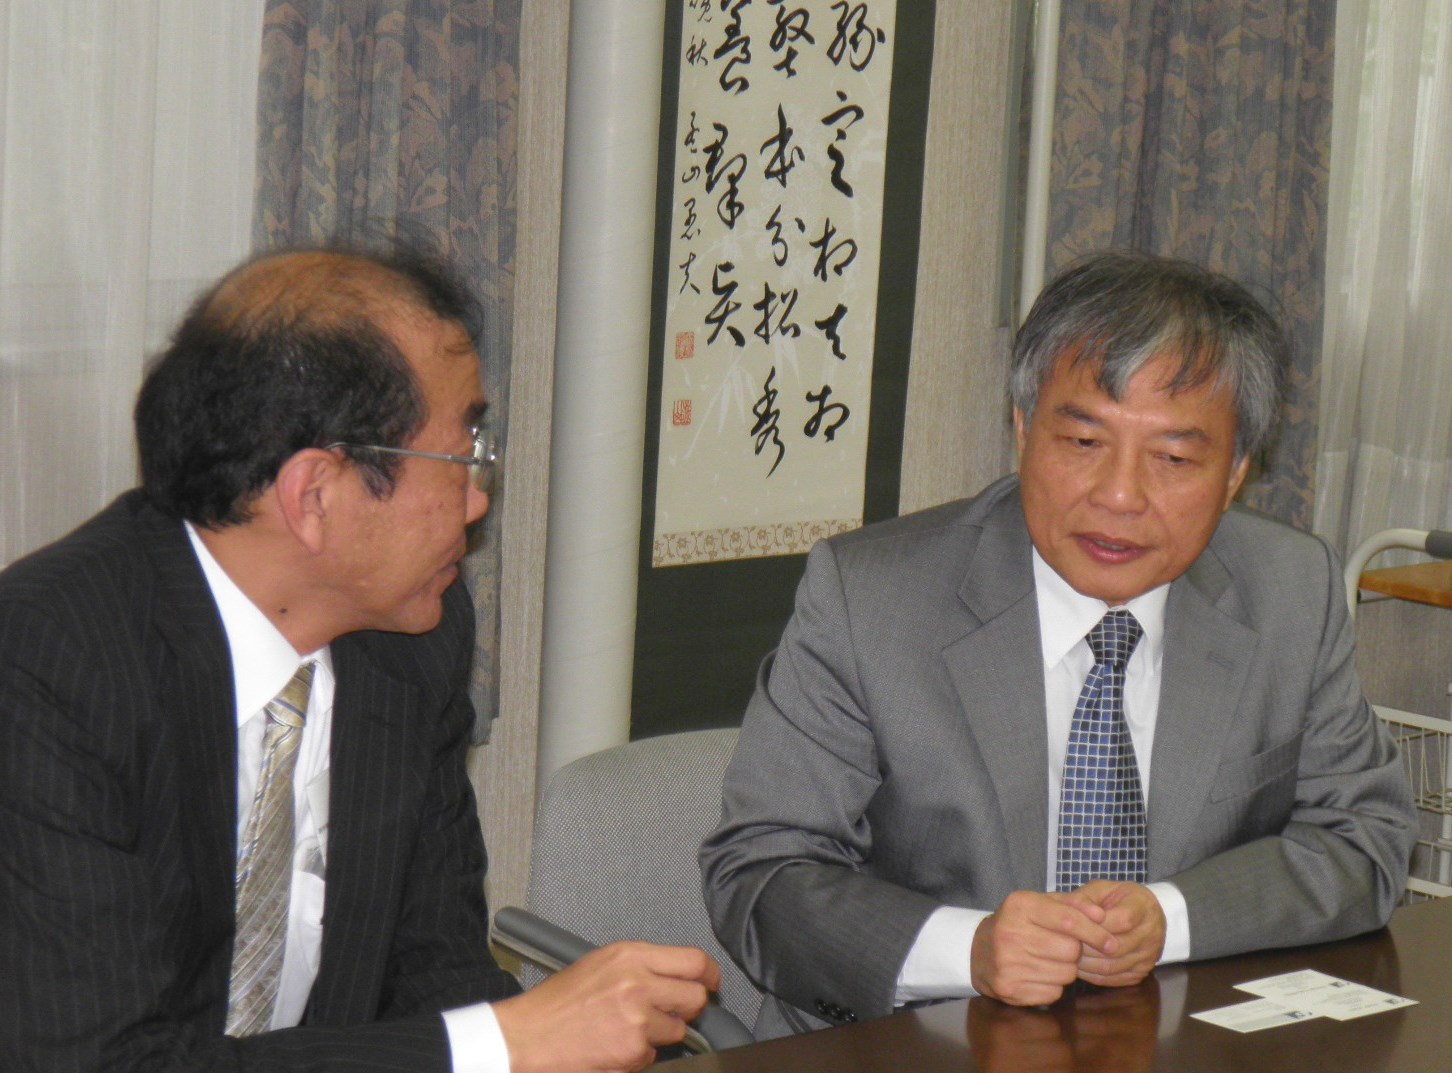 http://www.eco.u-toyama.ac.jp/news/images/20151001-1.jpg